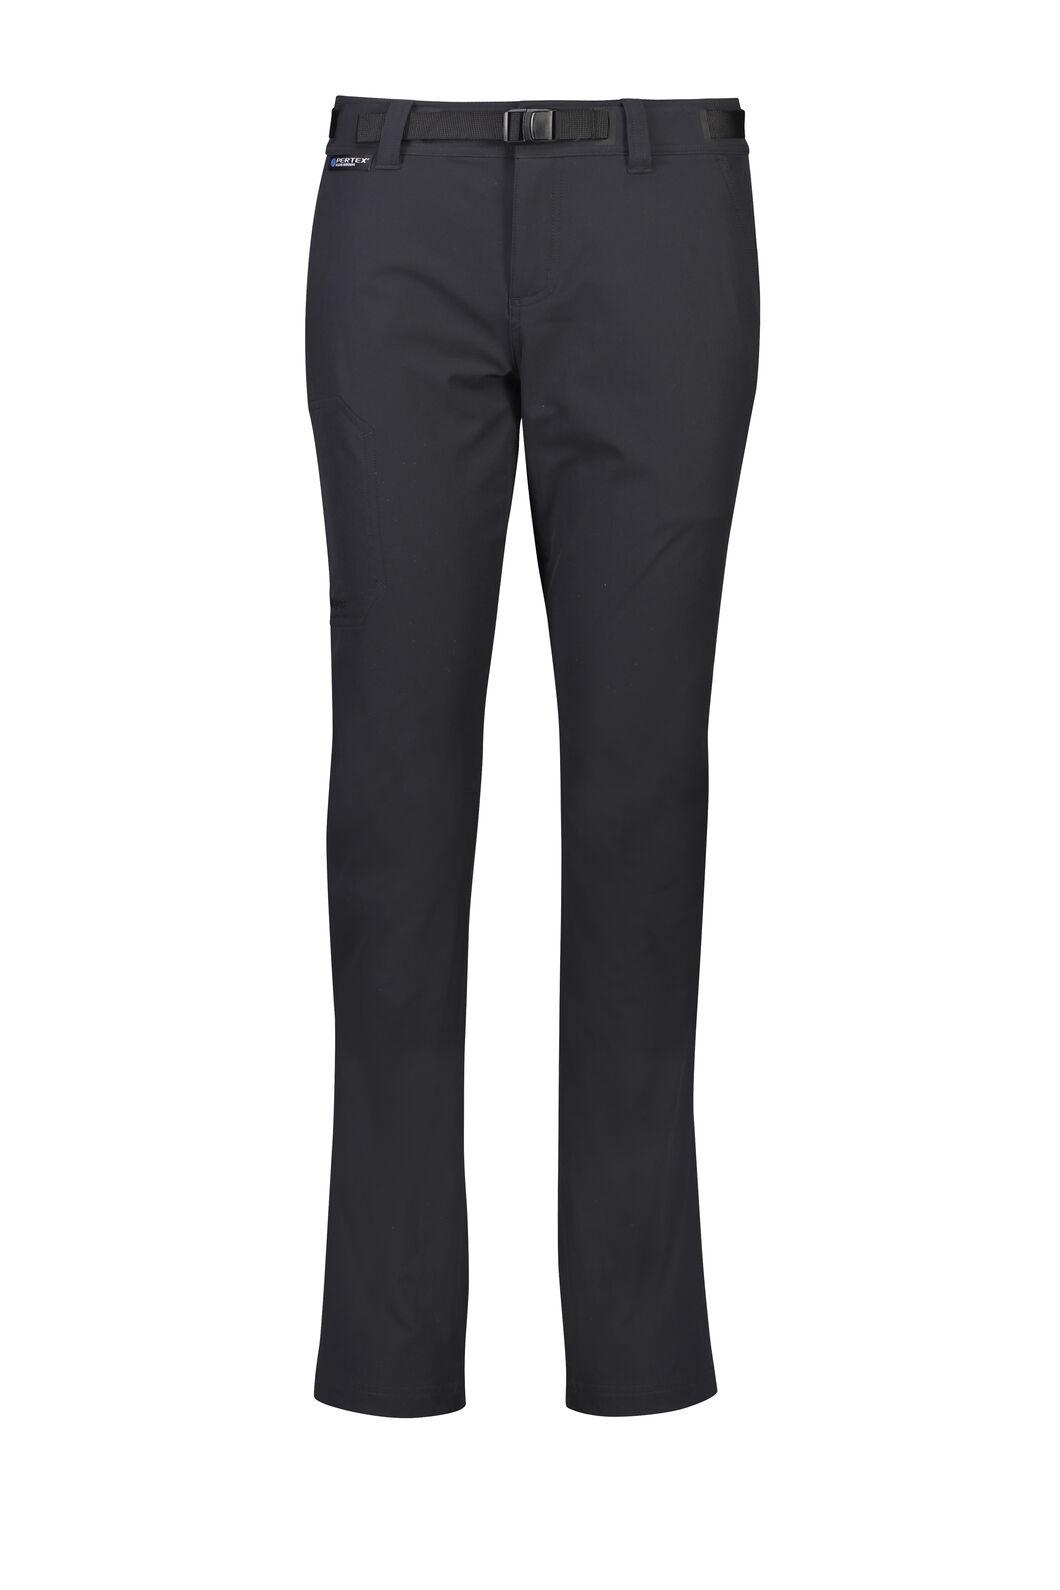 Macpac Trekker Pertex Equilibrium® Softshell Pants — Women's, Black, hi-res